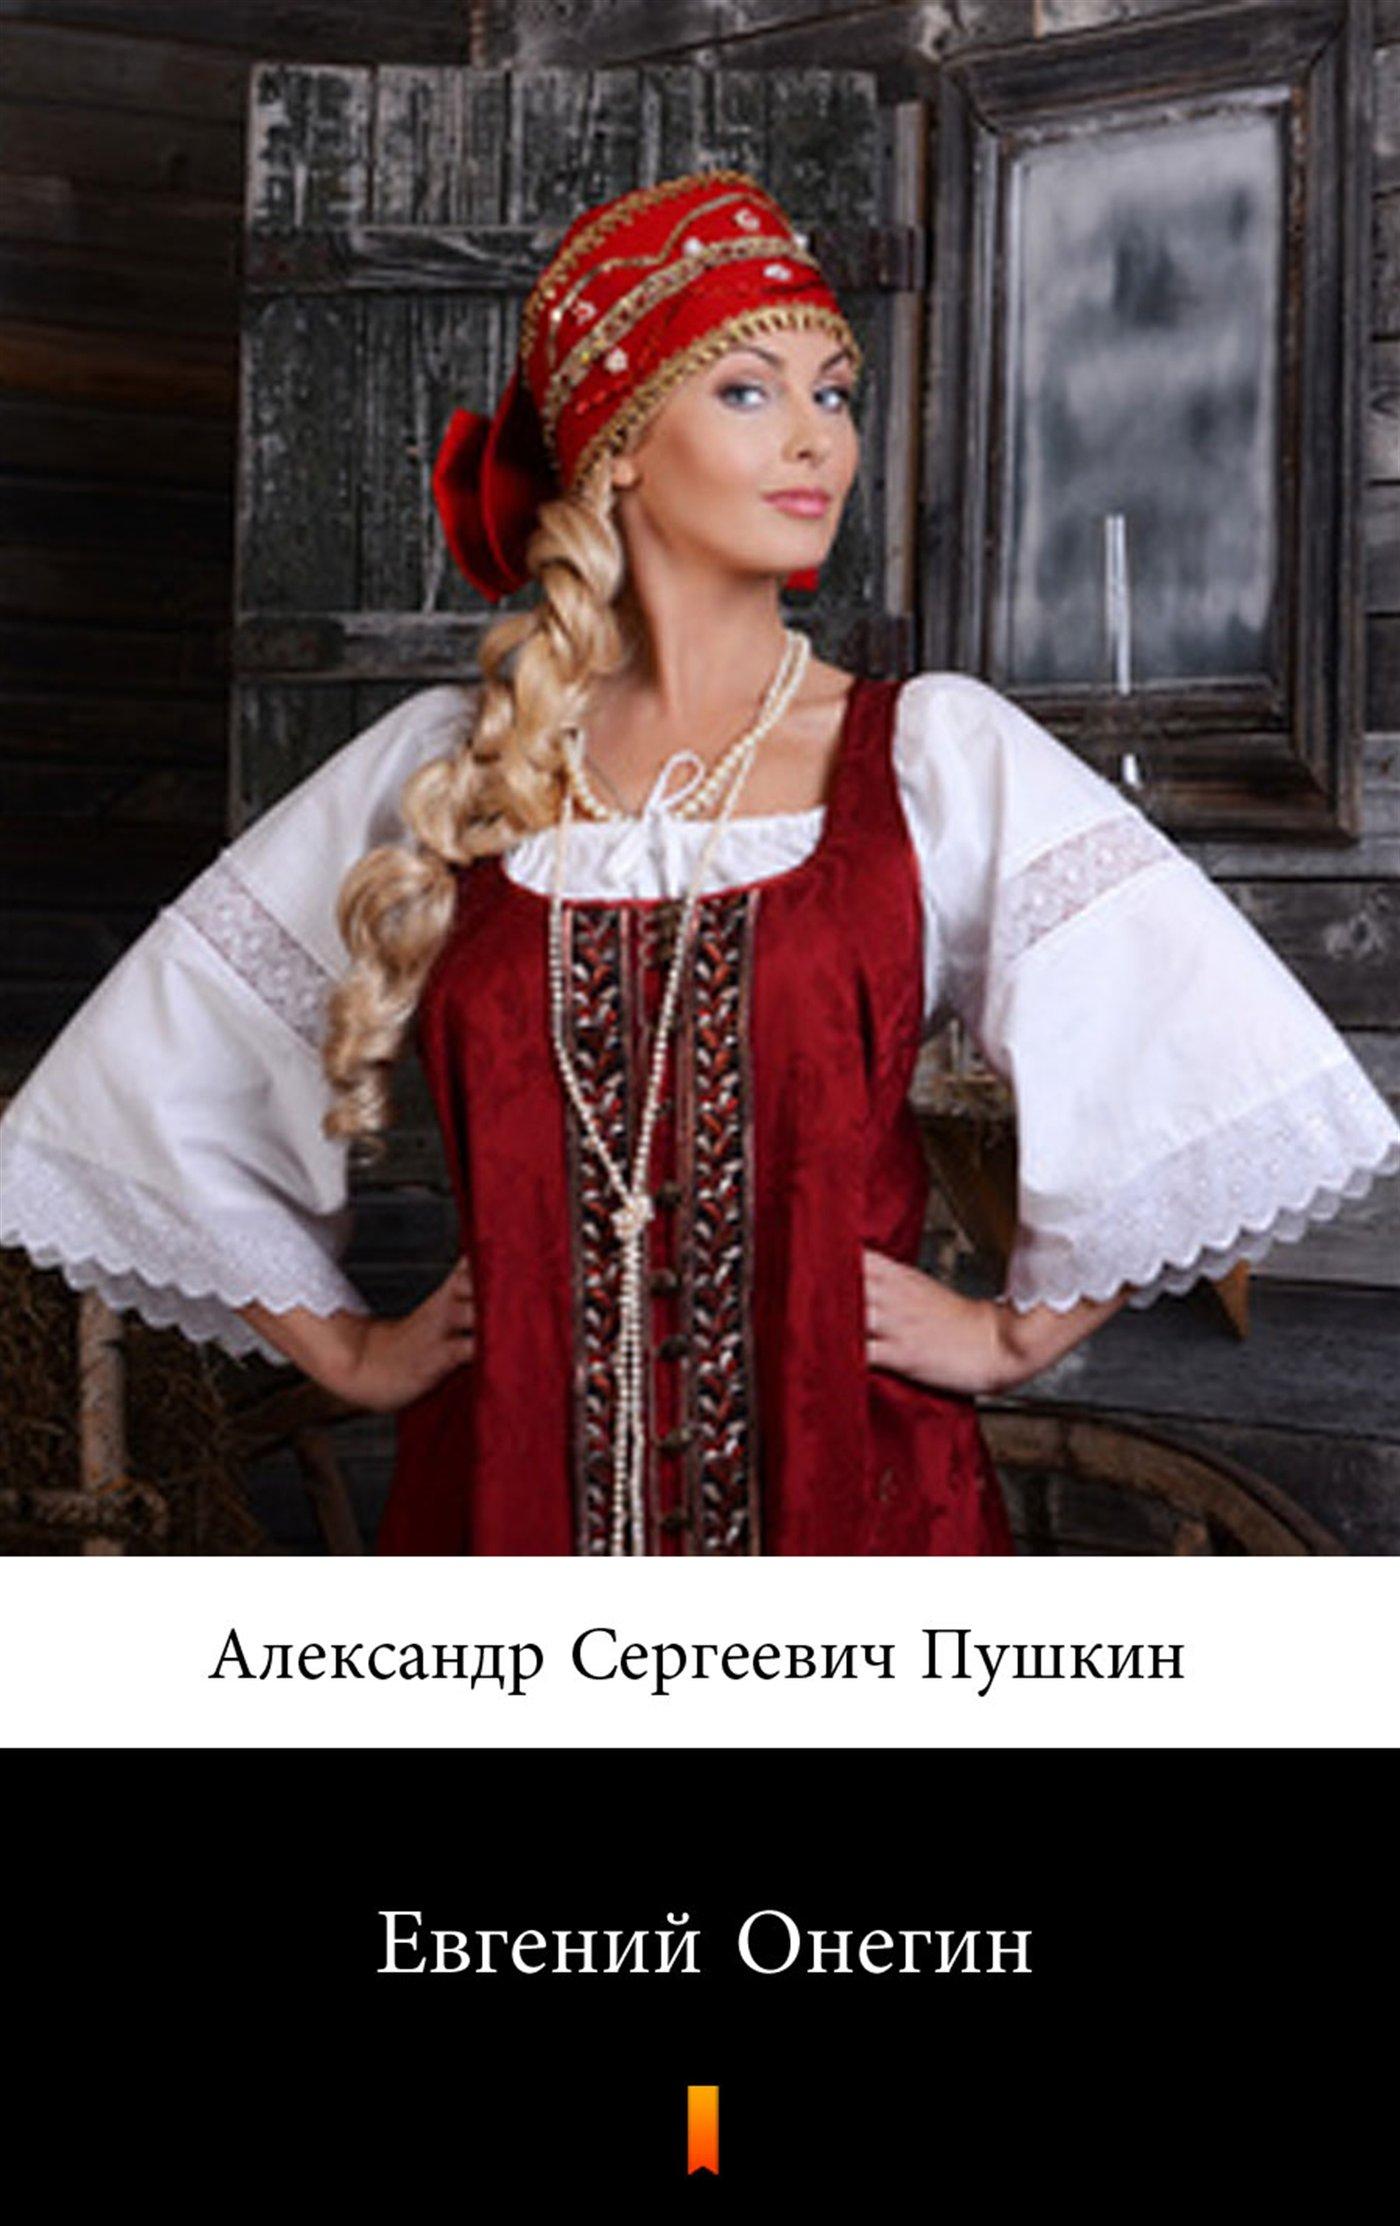 Евгений Онегин - Ebook (Książka na Kindle) do pobrania w formacie MOBI